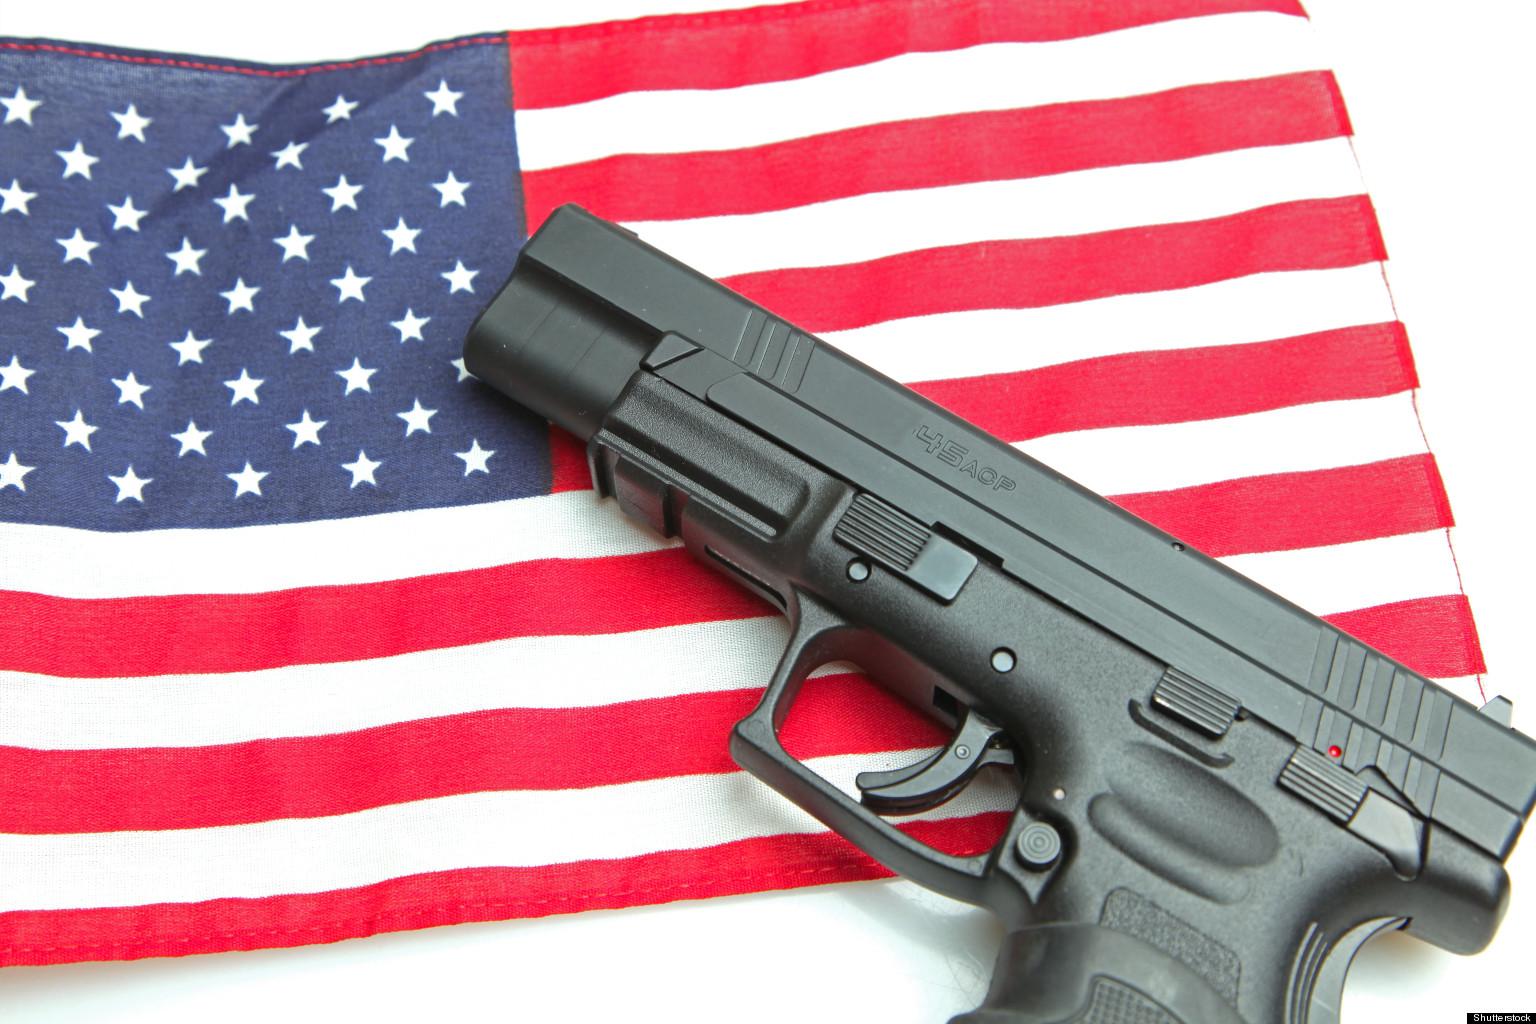 California Gun Confiscation Bill Passes Approves 24